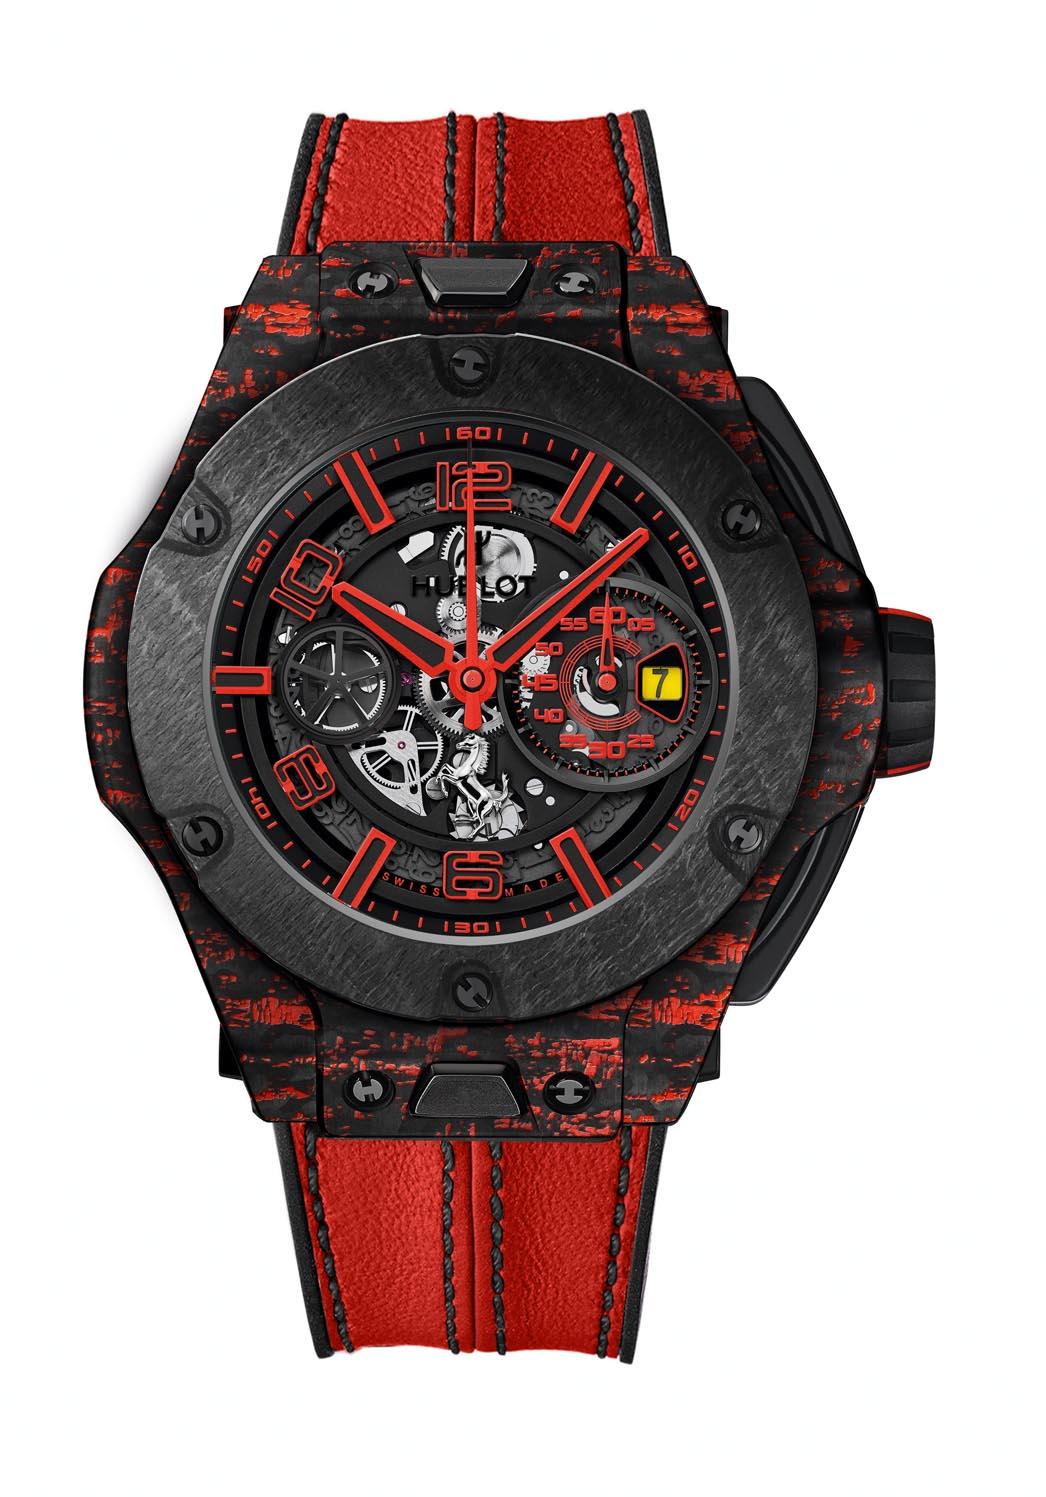 Hublot Big Bang Ferrari Scuderia Corsa limited edition